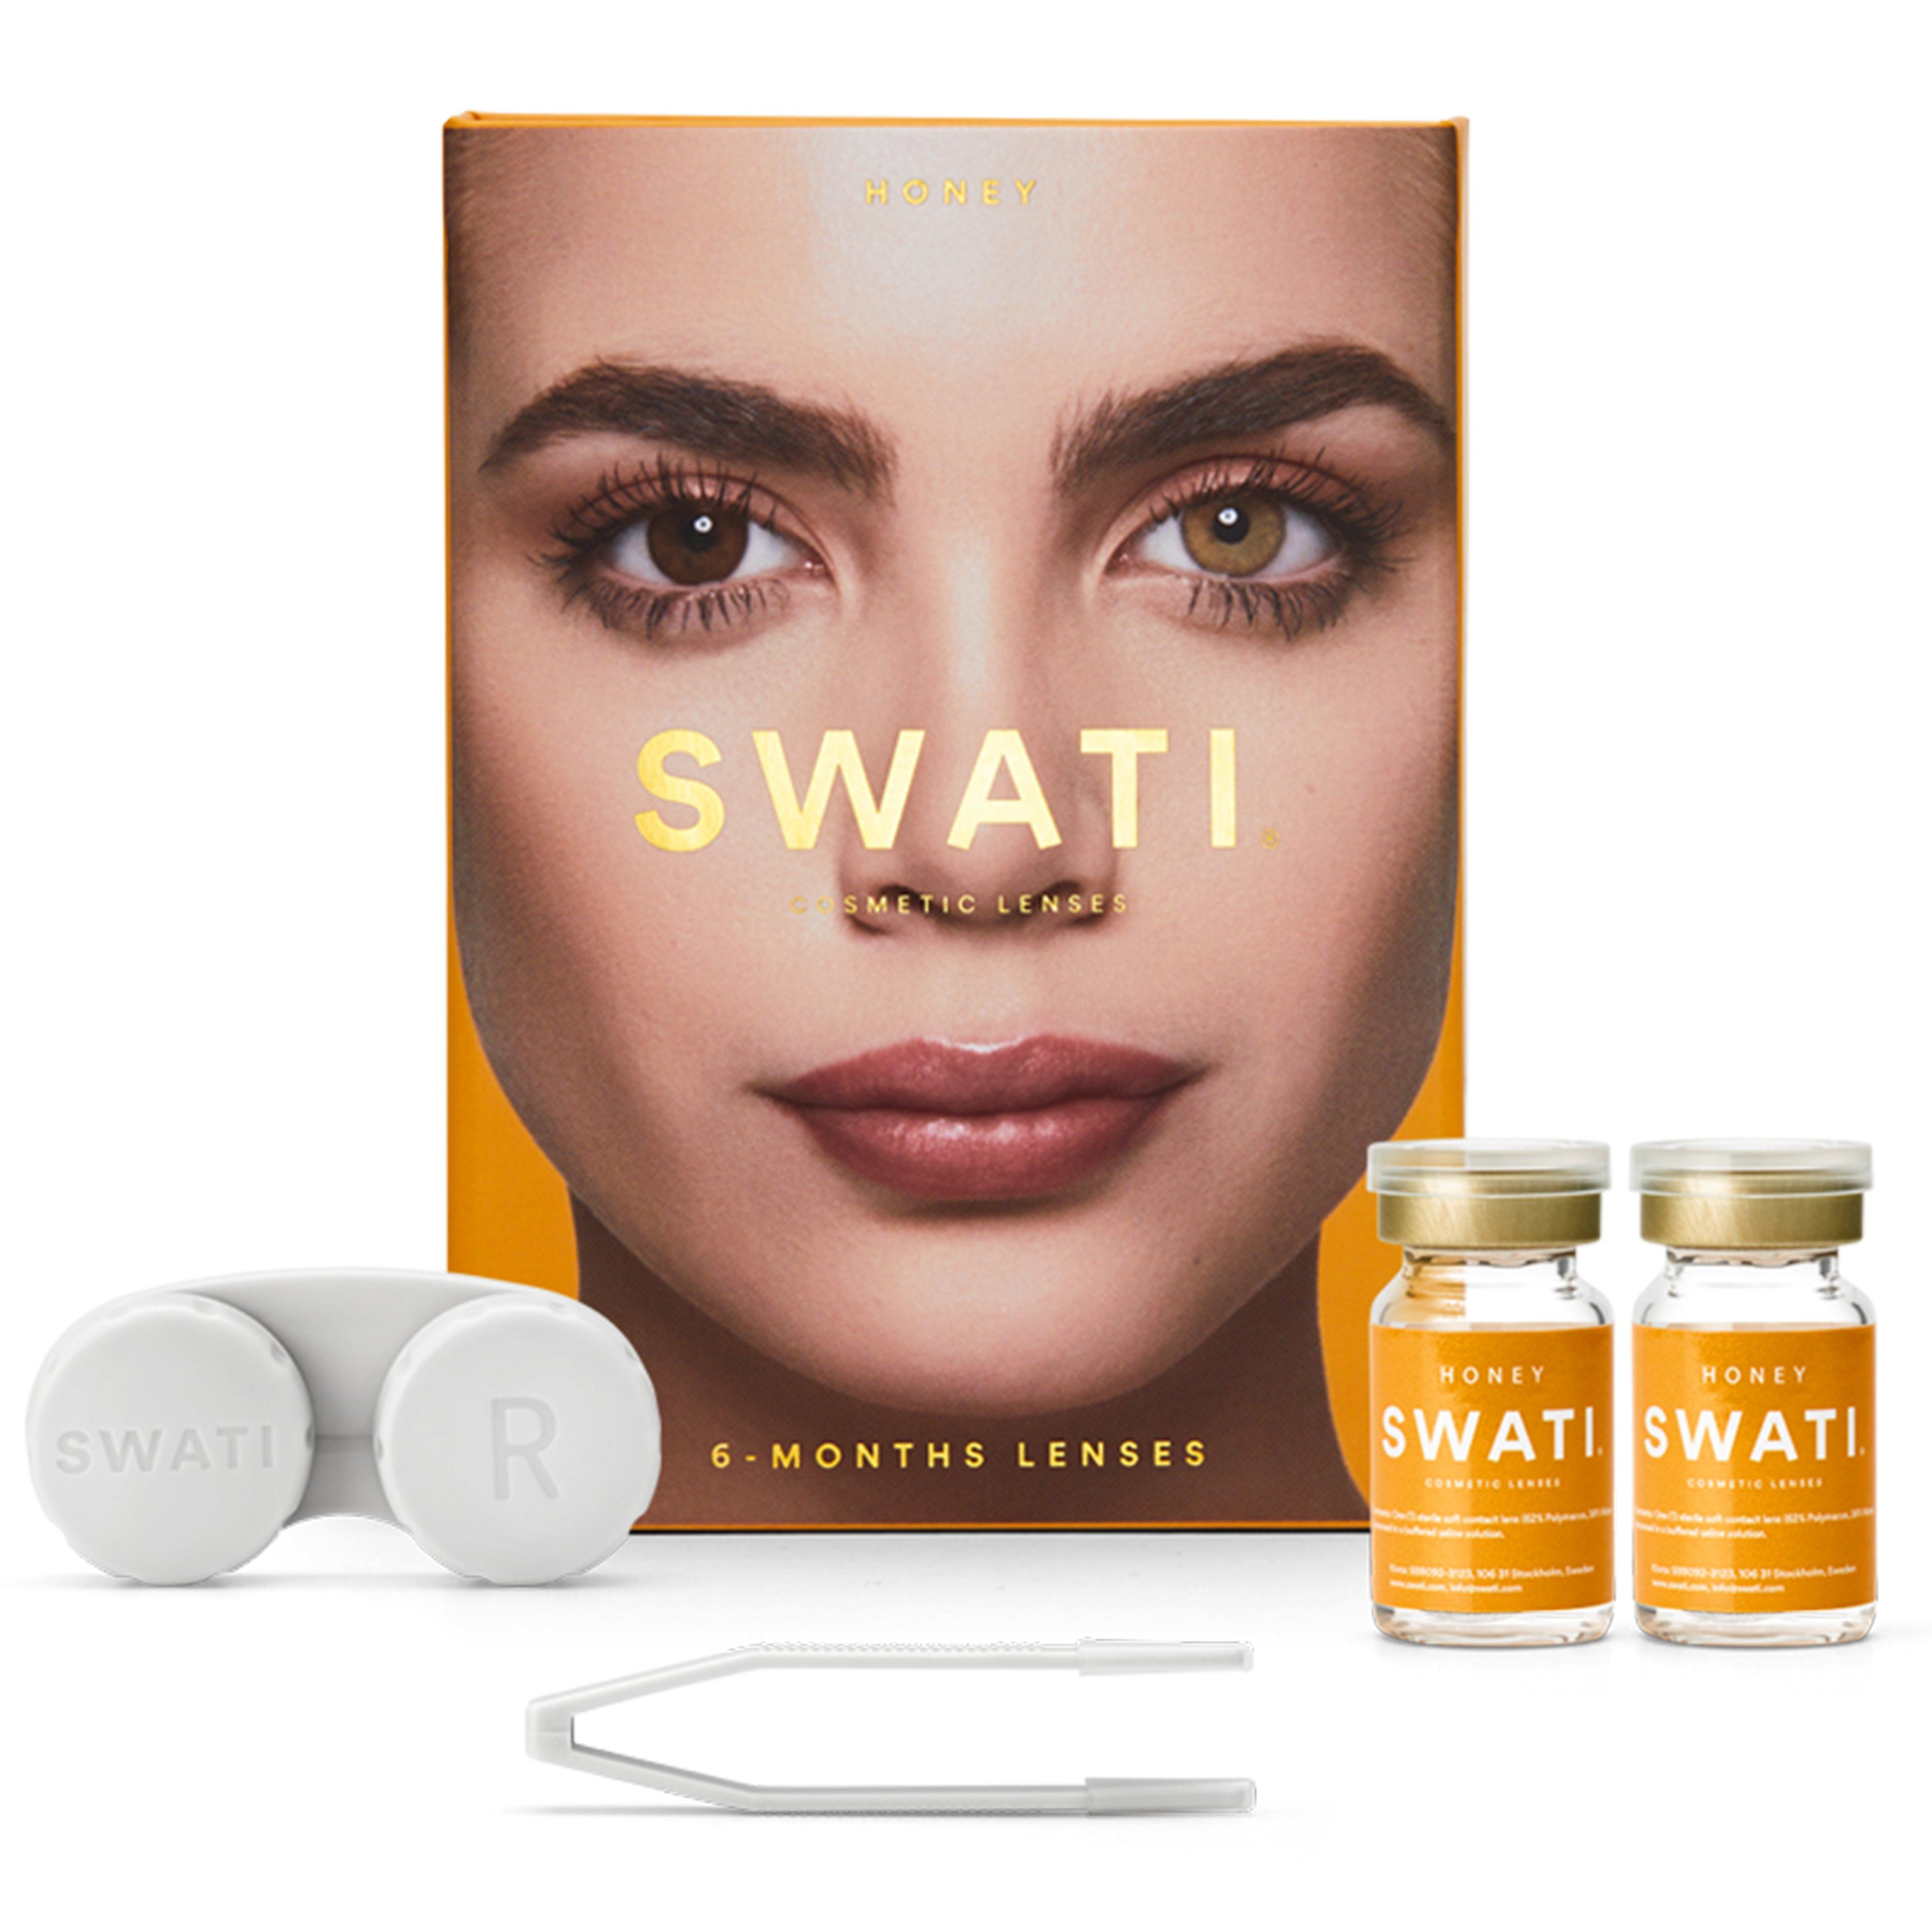 SWATI - Coloured Contact Lenses 6 Months - Honey